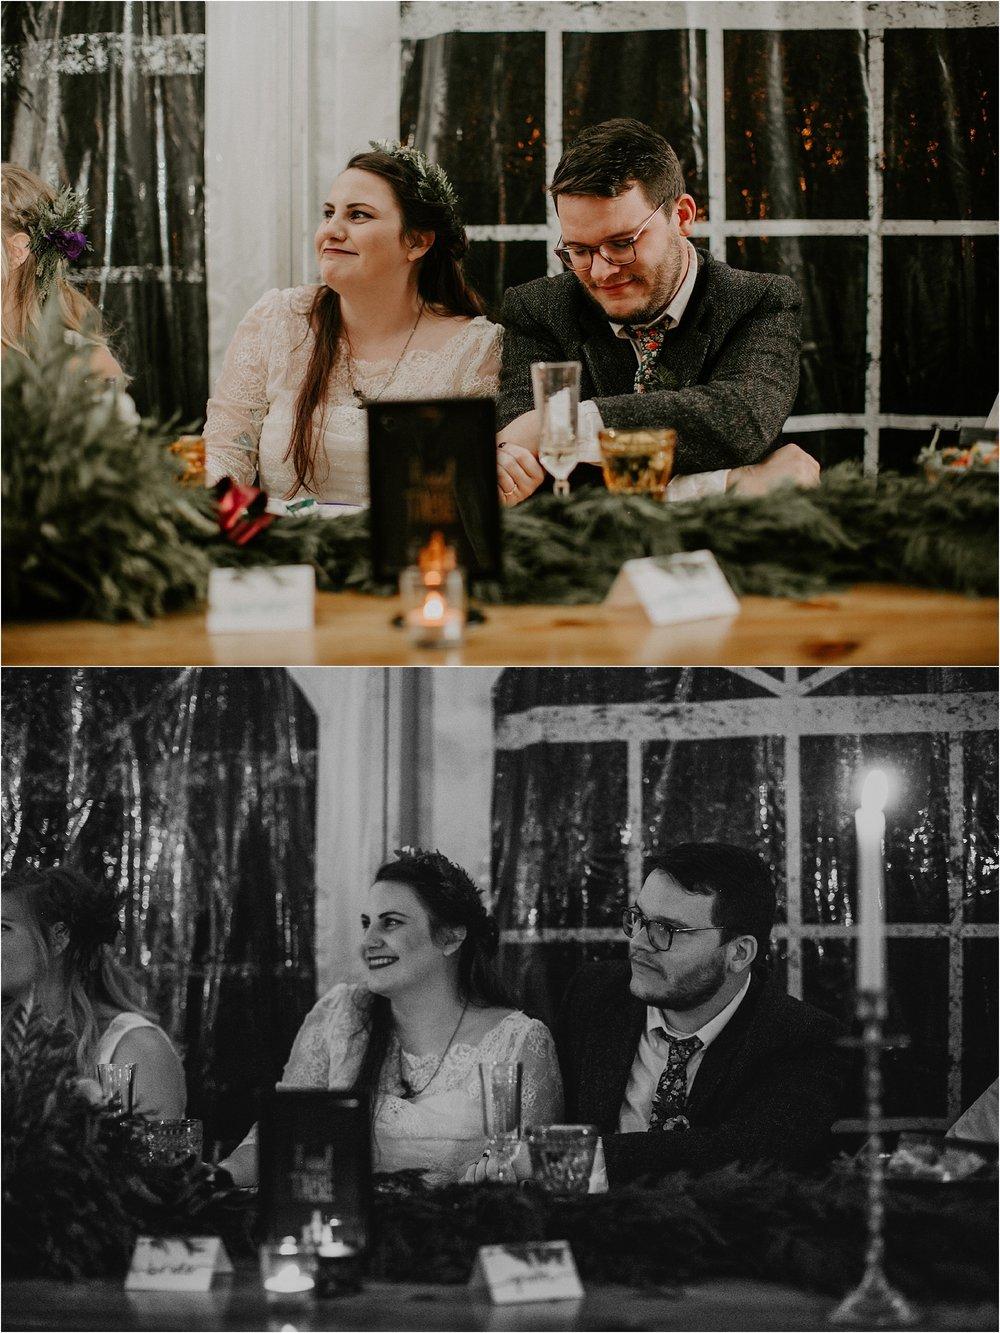 Sarah_Brookhart_Baltimore_Wedding_Photographer_0065.jpg